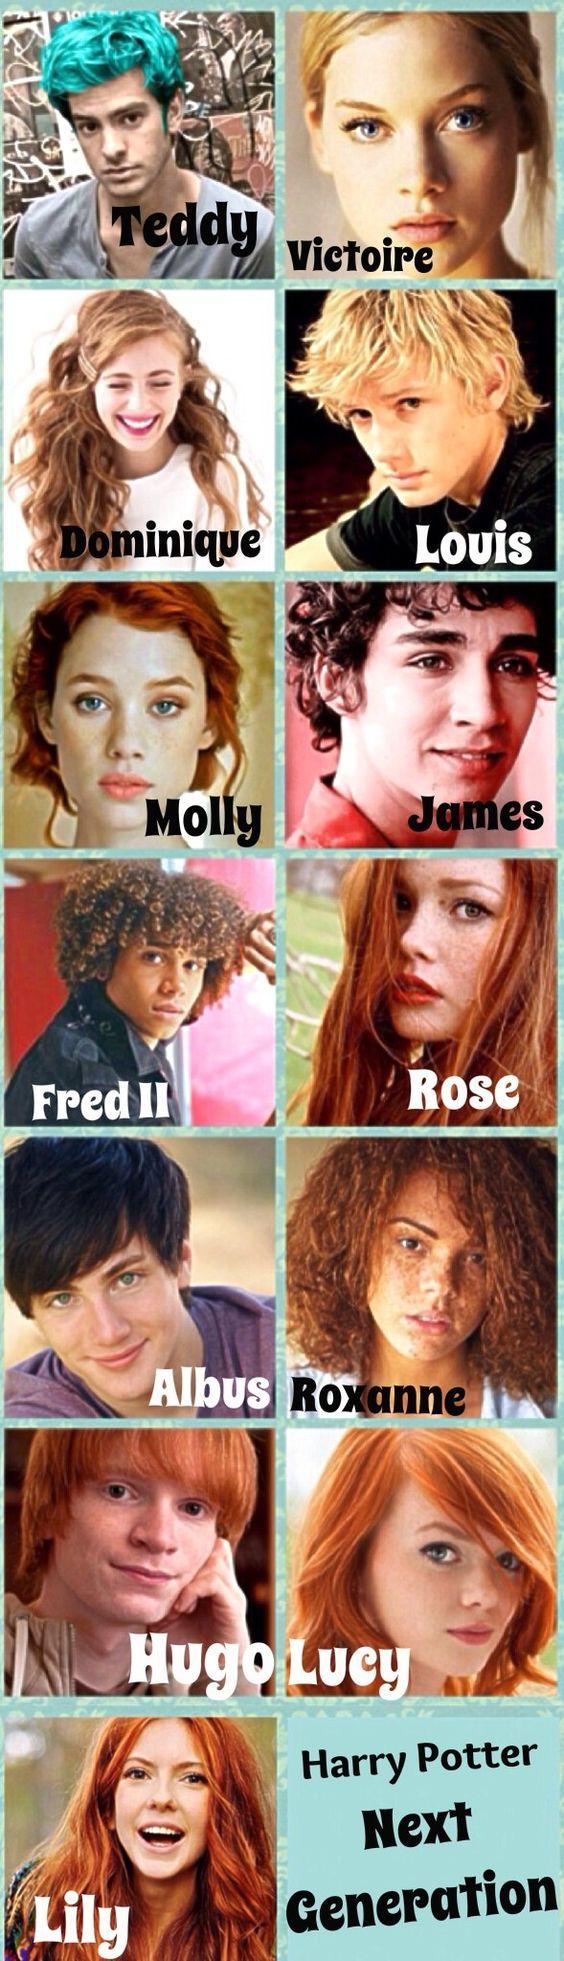 Harry Potter Next Generation!